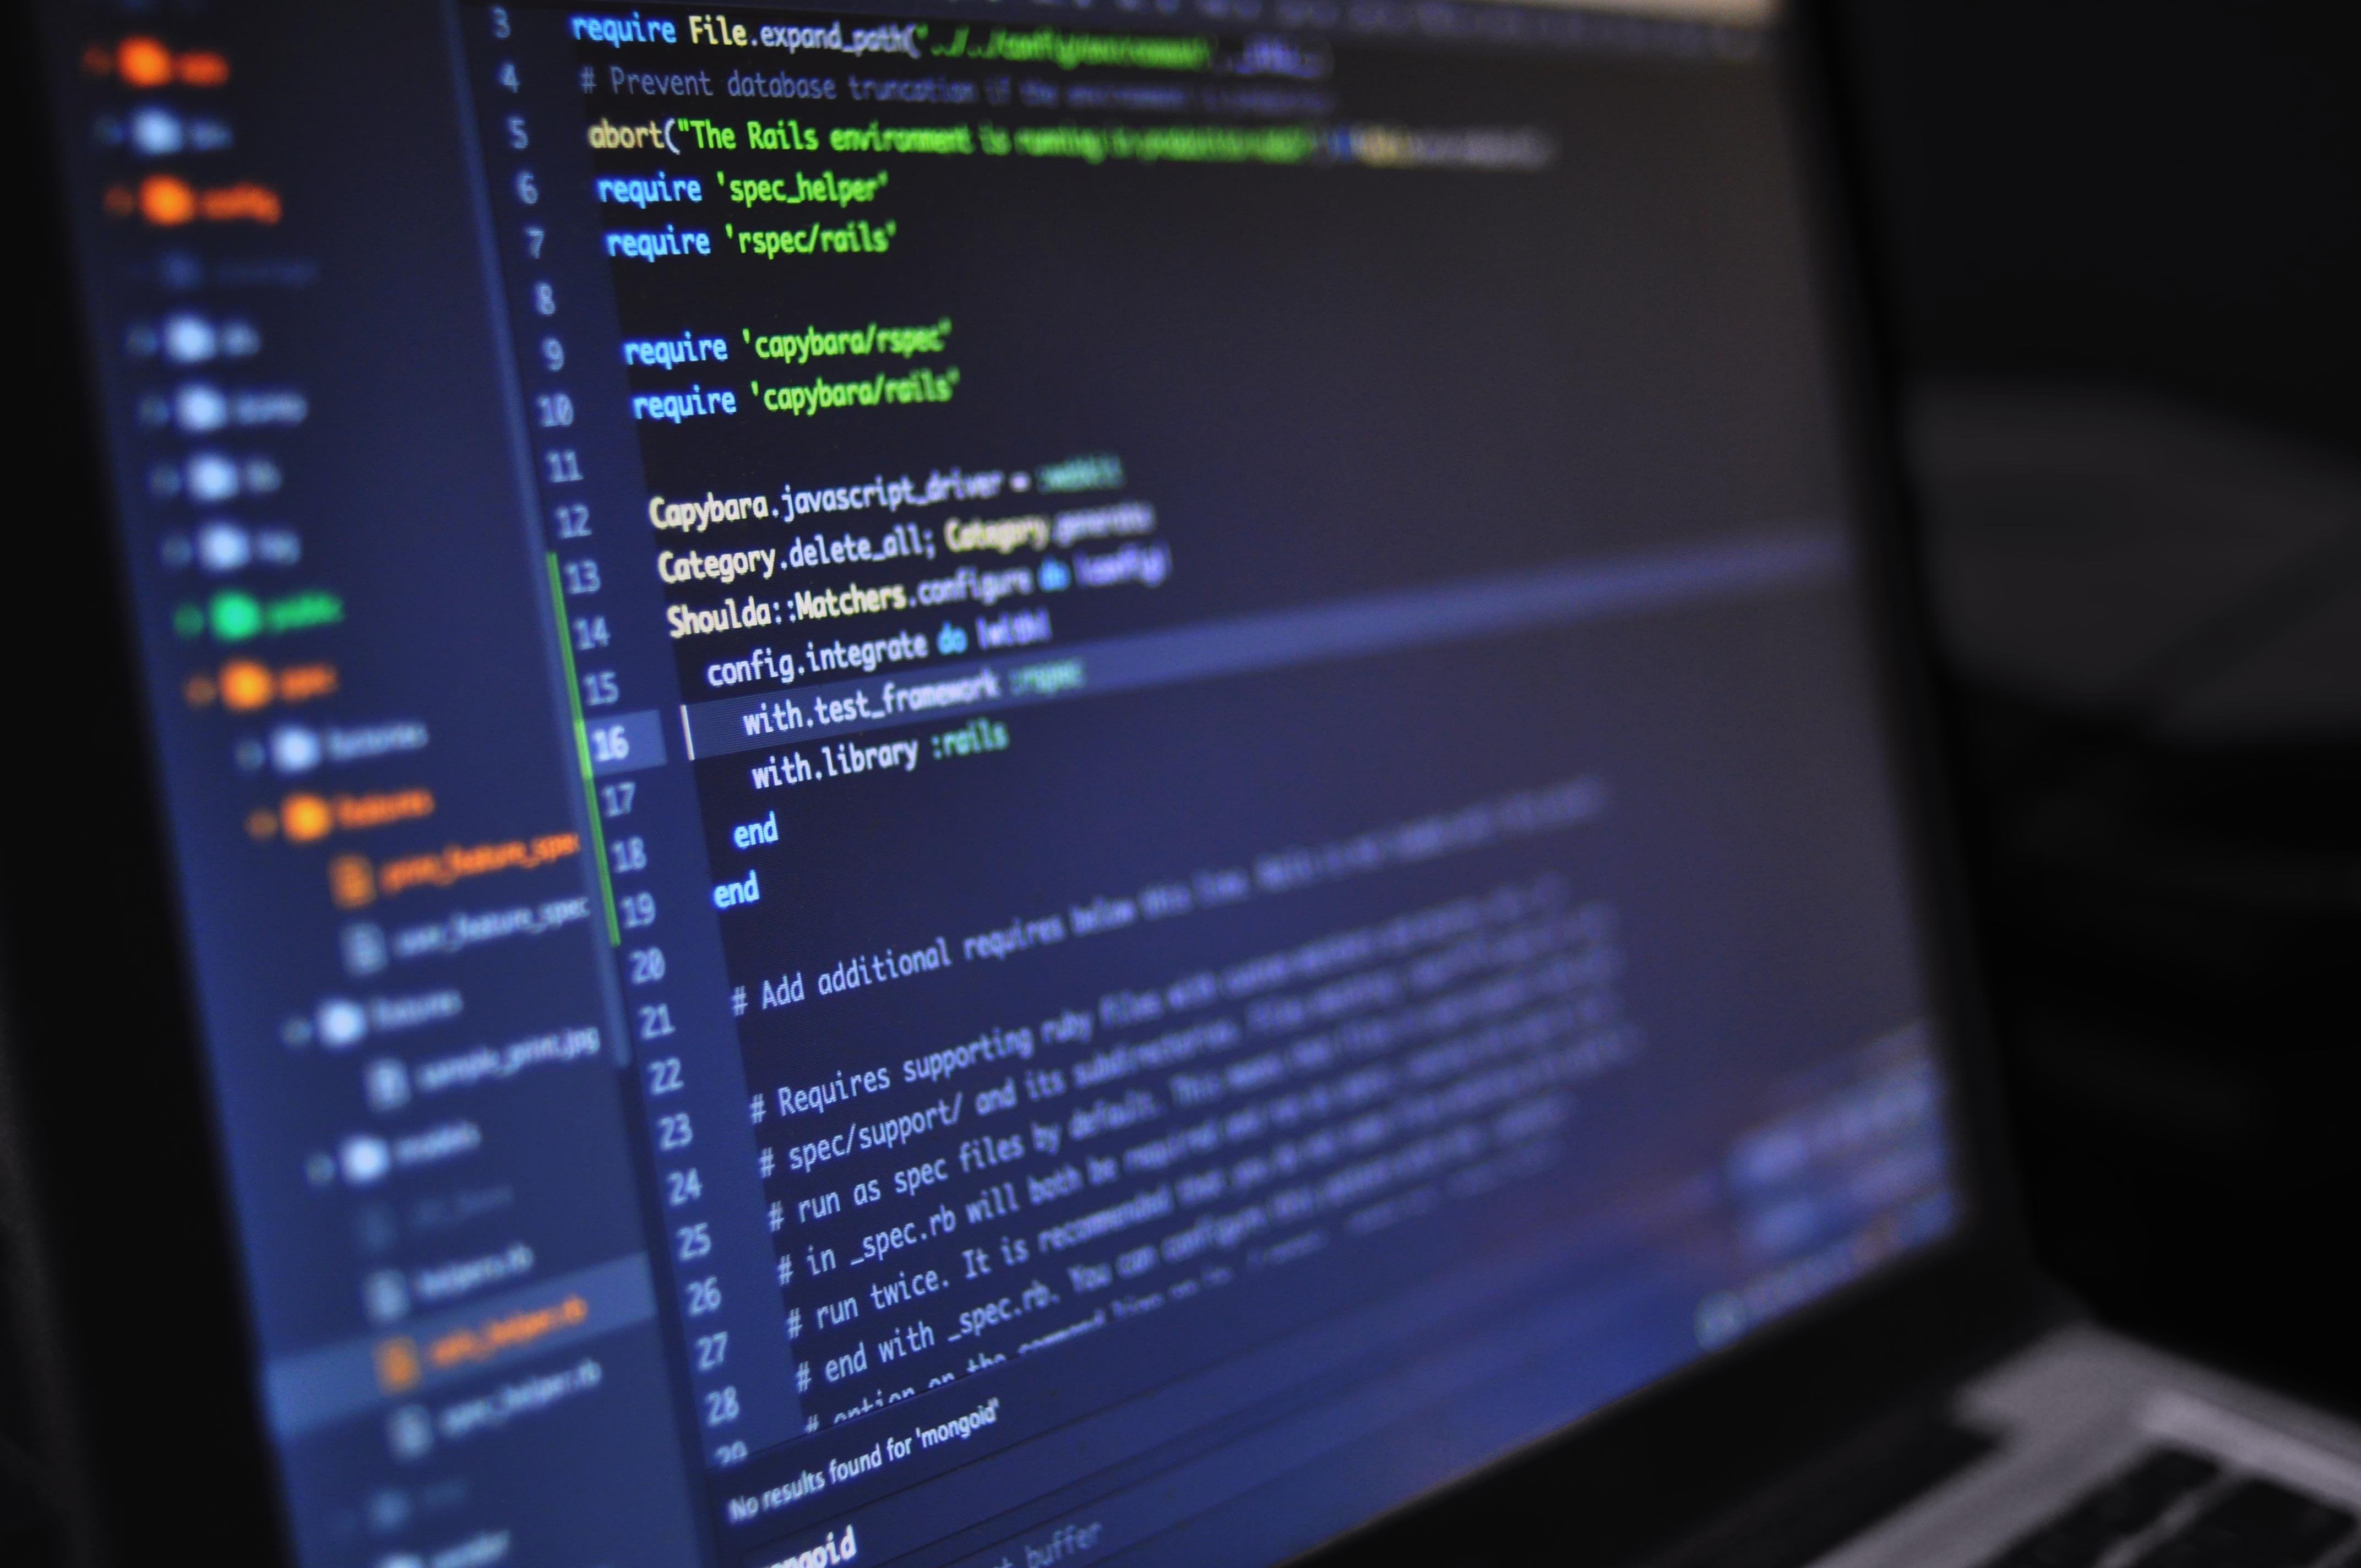 【Vagrant使ってる人向け】Ruby on Railsでwebpack-dev-serverがrecompileしてくれないときの対処【暫定版】